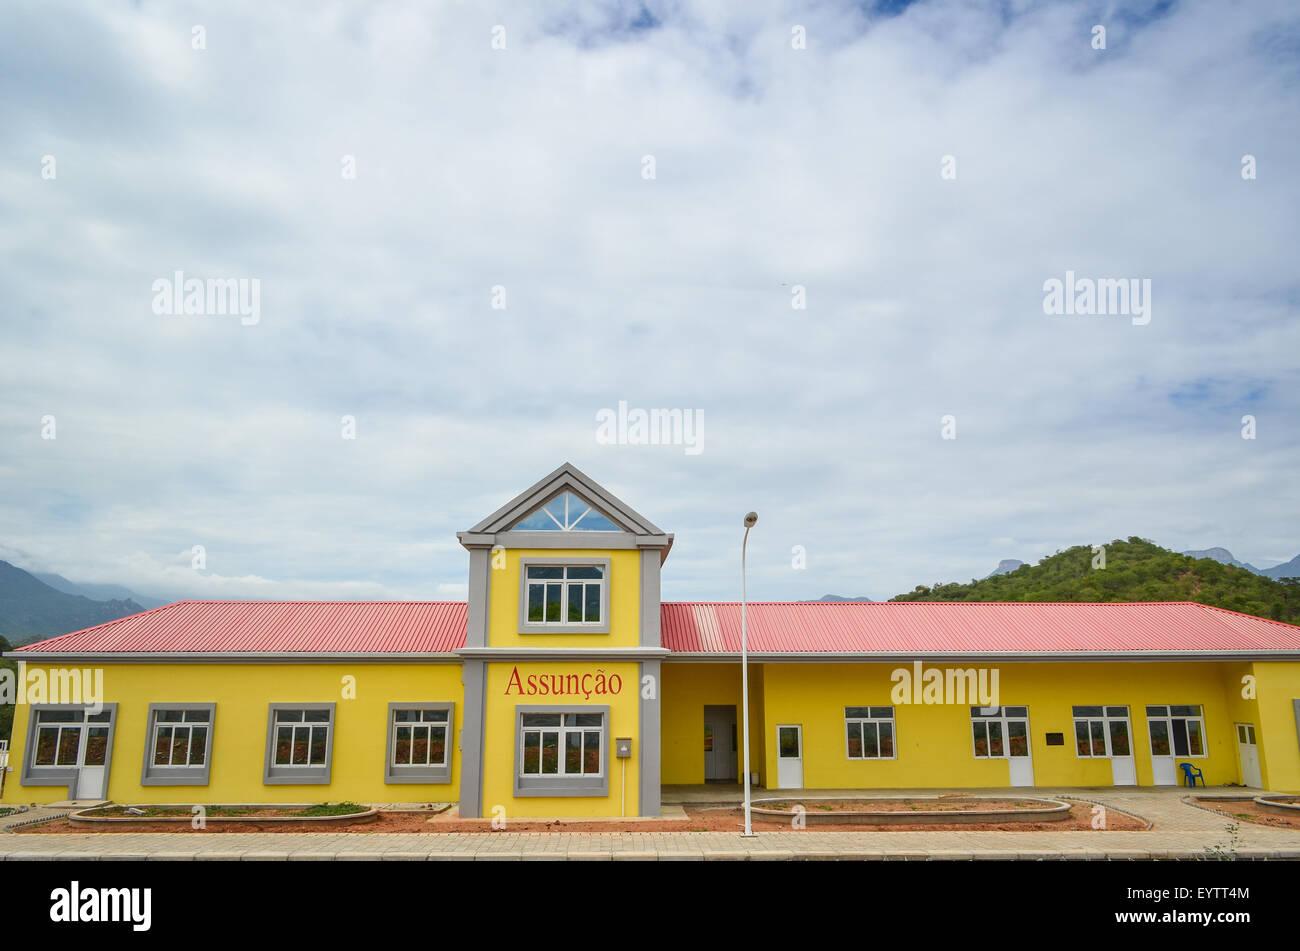 New Chinese-built train station in Assuncao, on the Lubango-Namibe railway, Angola - Stock Image